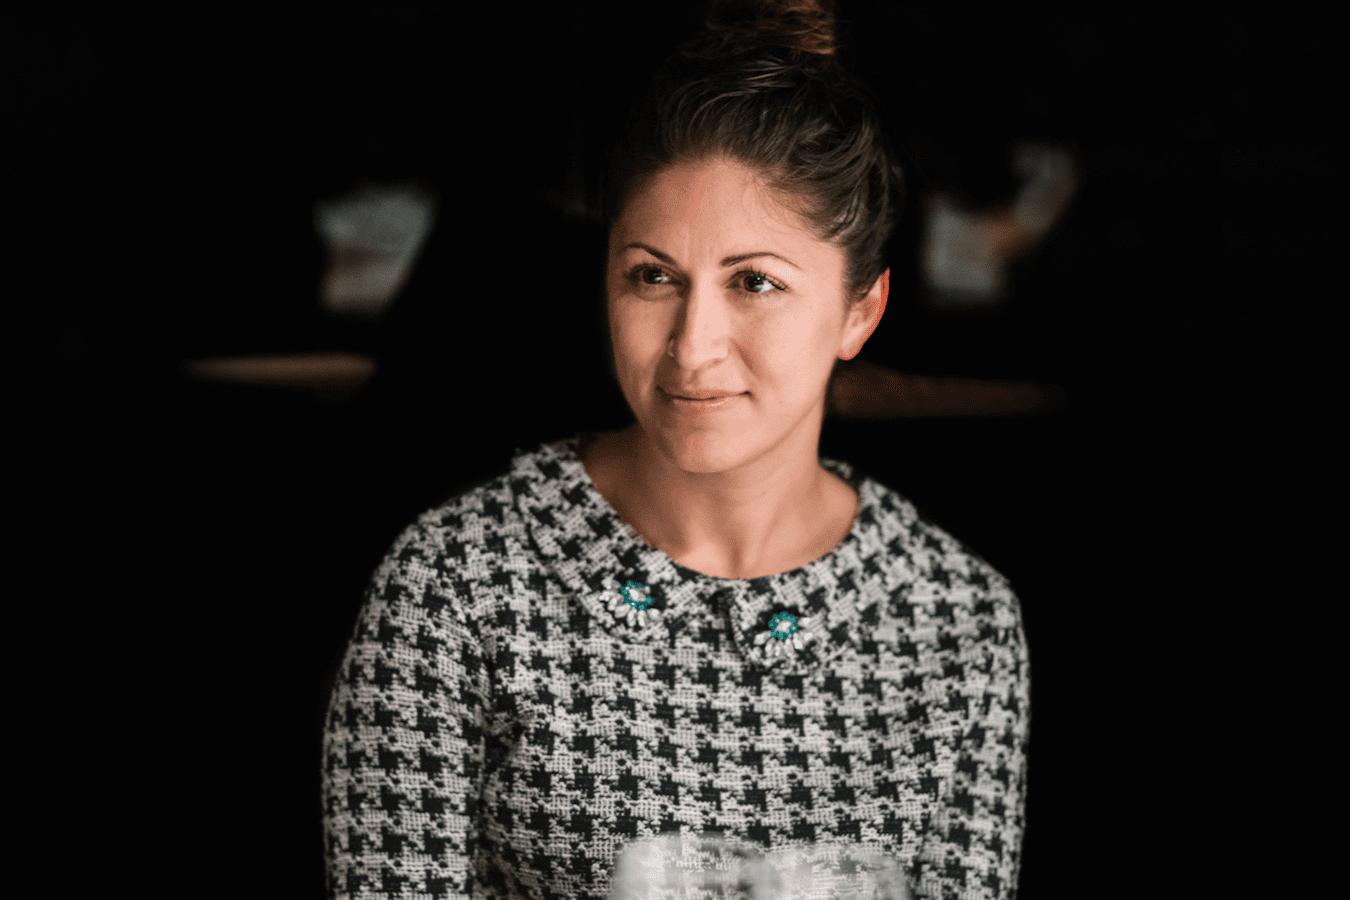 Communiquer efficacement quand tout va vite : les conseils d'Olga Farman